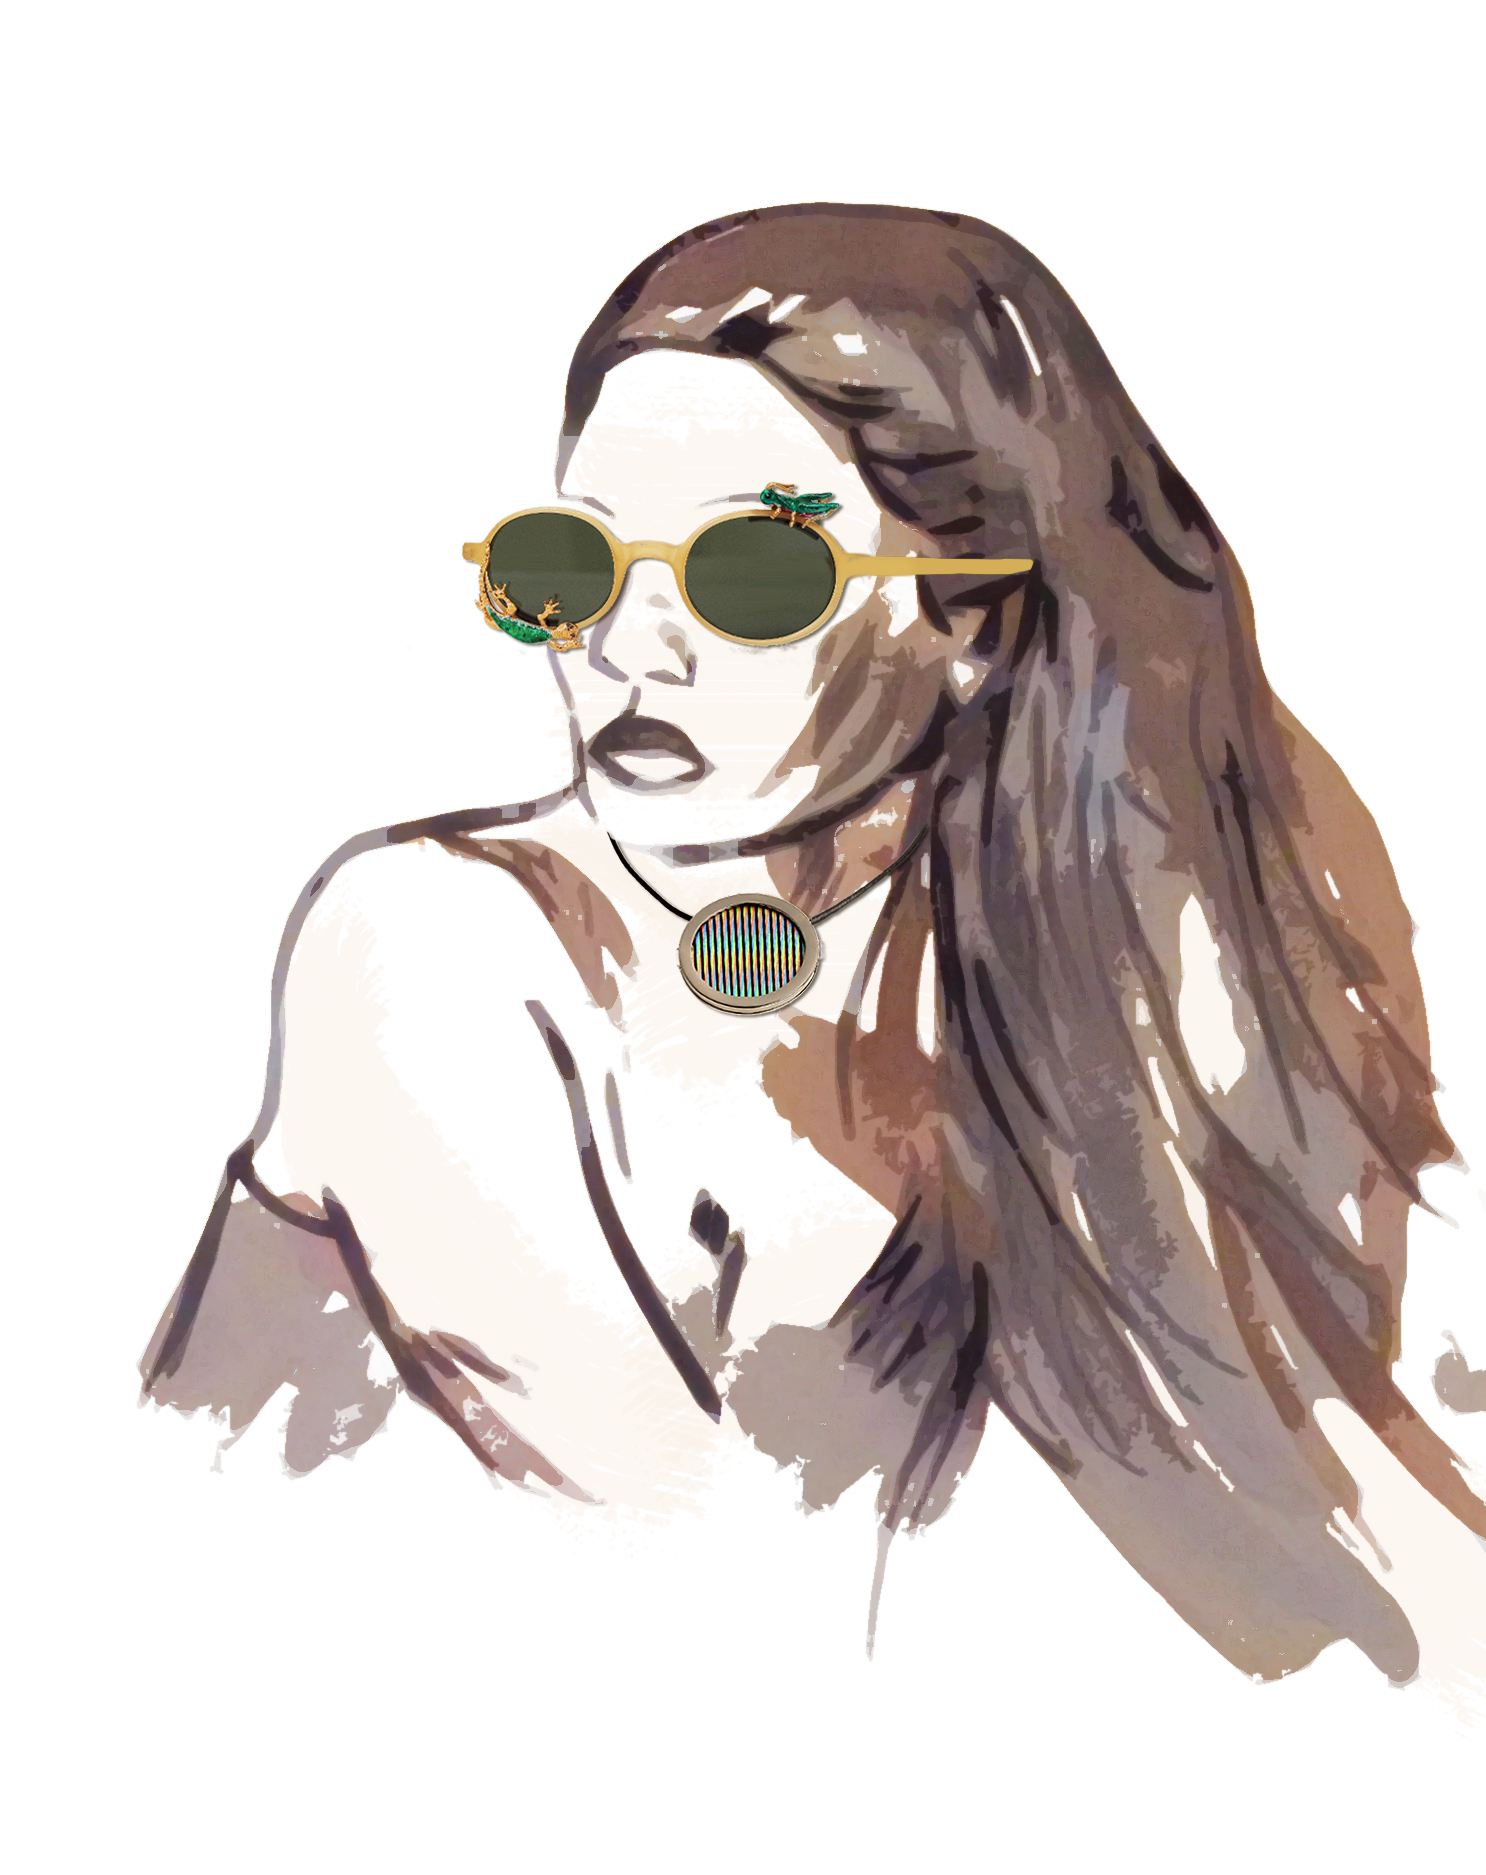 41- Avish Khebrezadeh Maskhara with Lizard and Cricket sunglasses; Carlos Cruz Diez Chromointerférence necklace